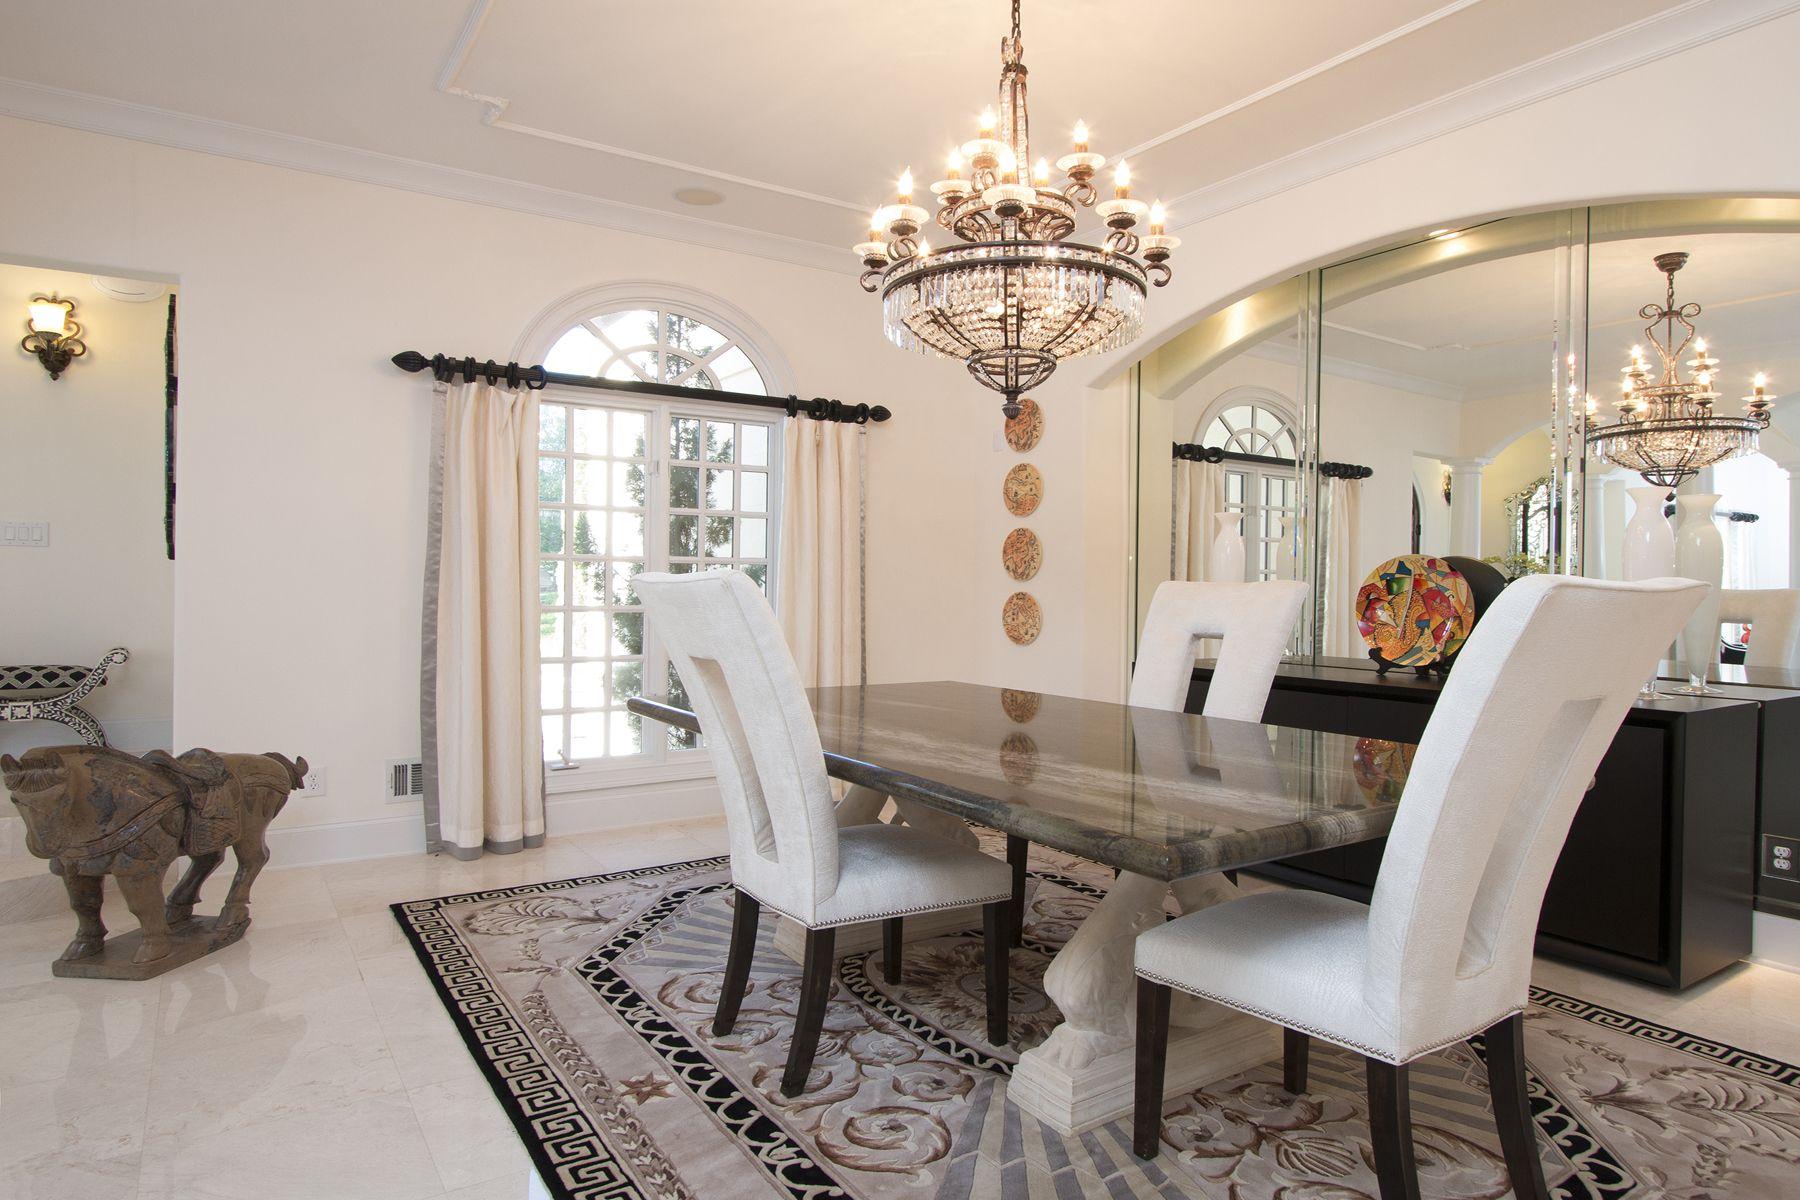 20 Allatoona Estates Drive SE Acworth, Georgia, United States – Luxury Home For Sale